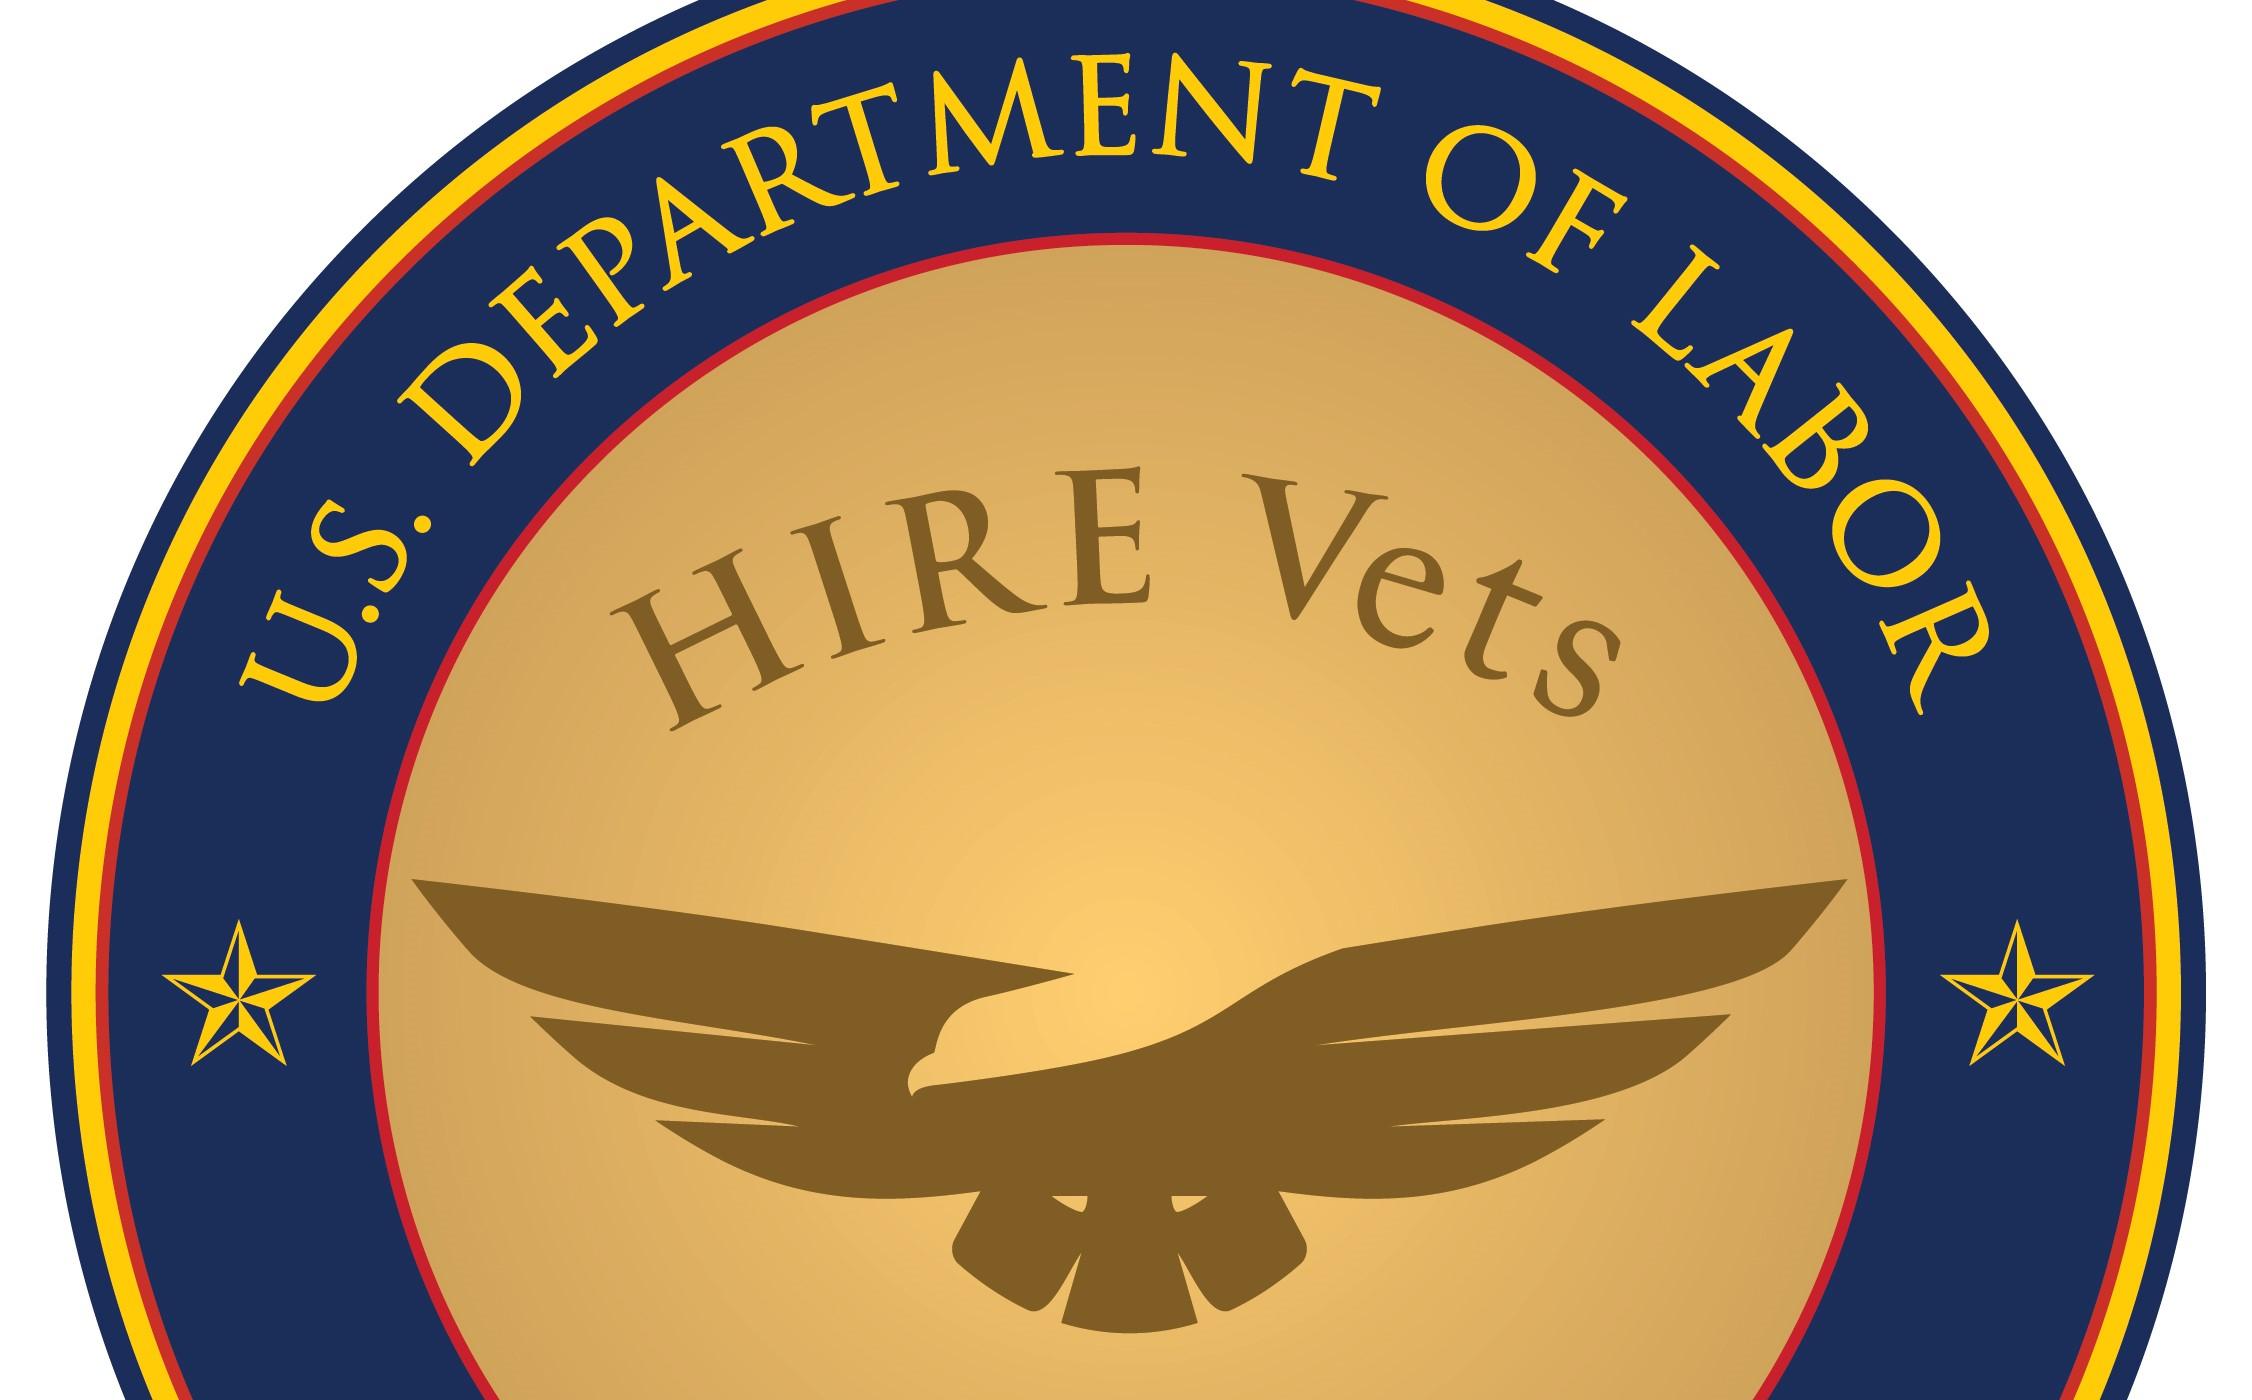 Hire Vets Medallion Program Analytical Engineering Inc